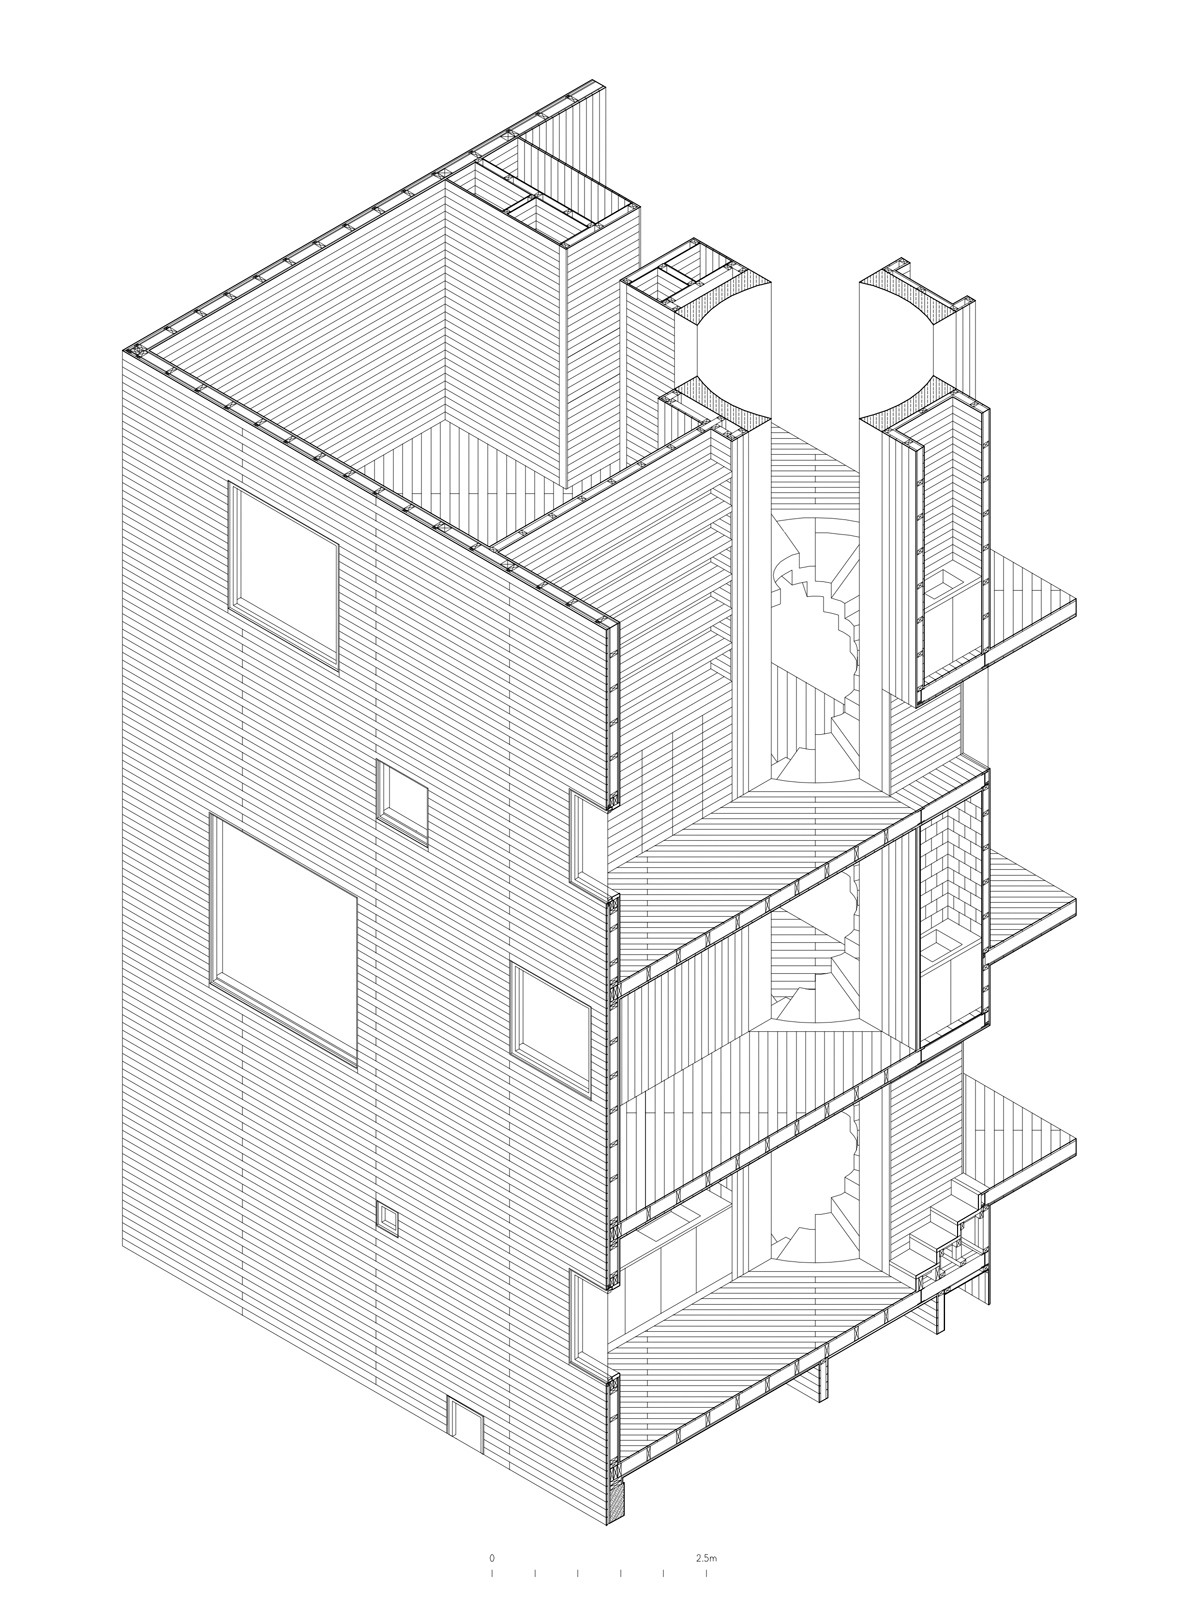 Gallery of gago house pezo von ellrichshausen 21 gago houseconstruction axon ccuart Gallery